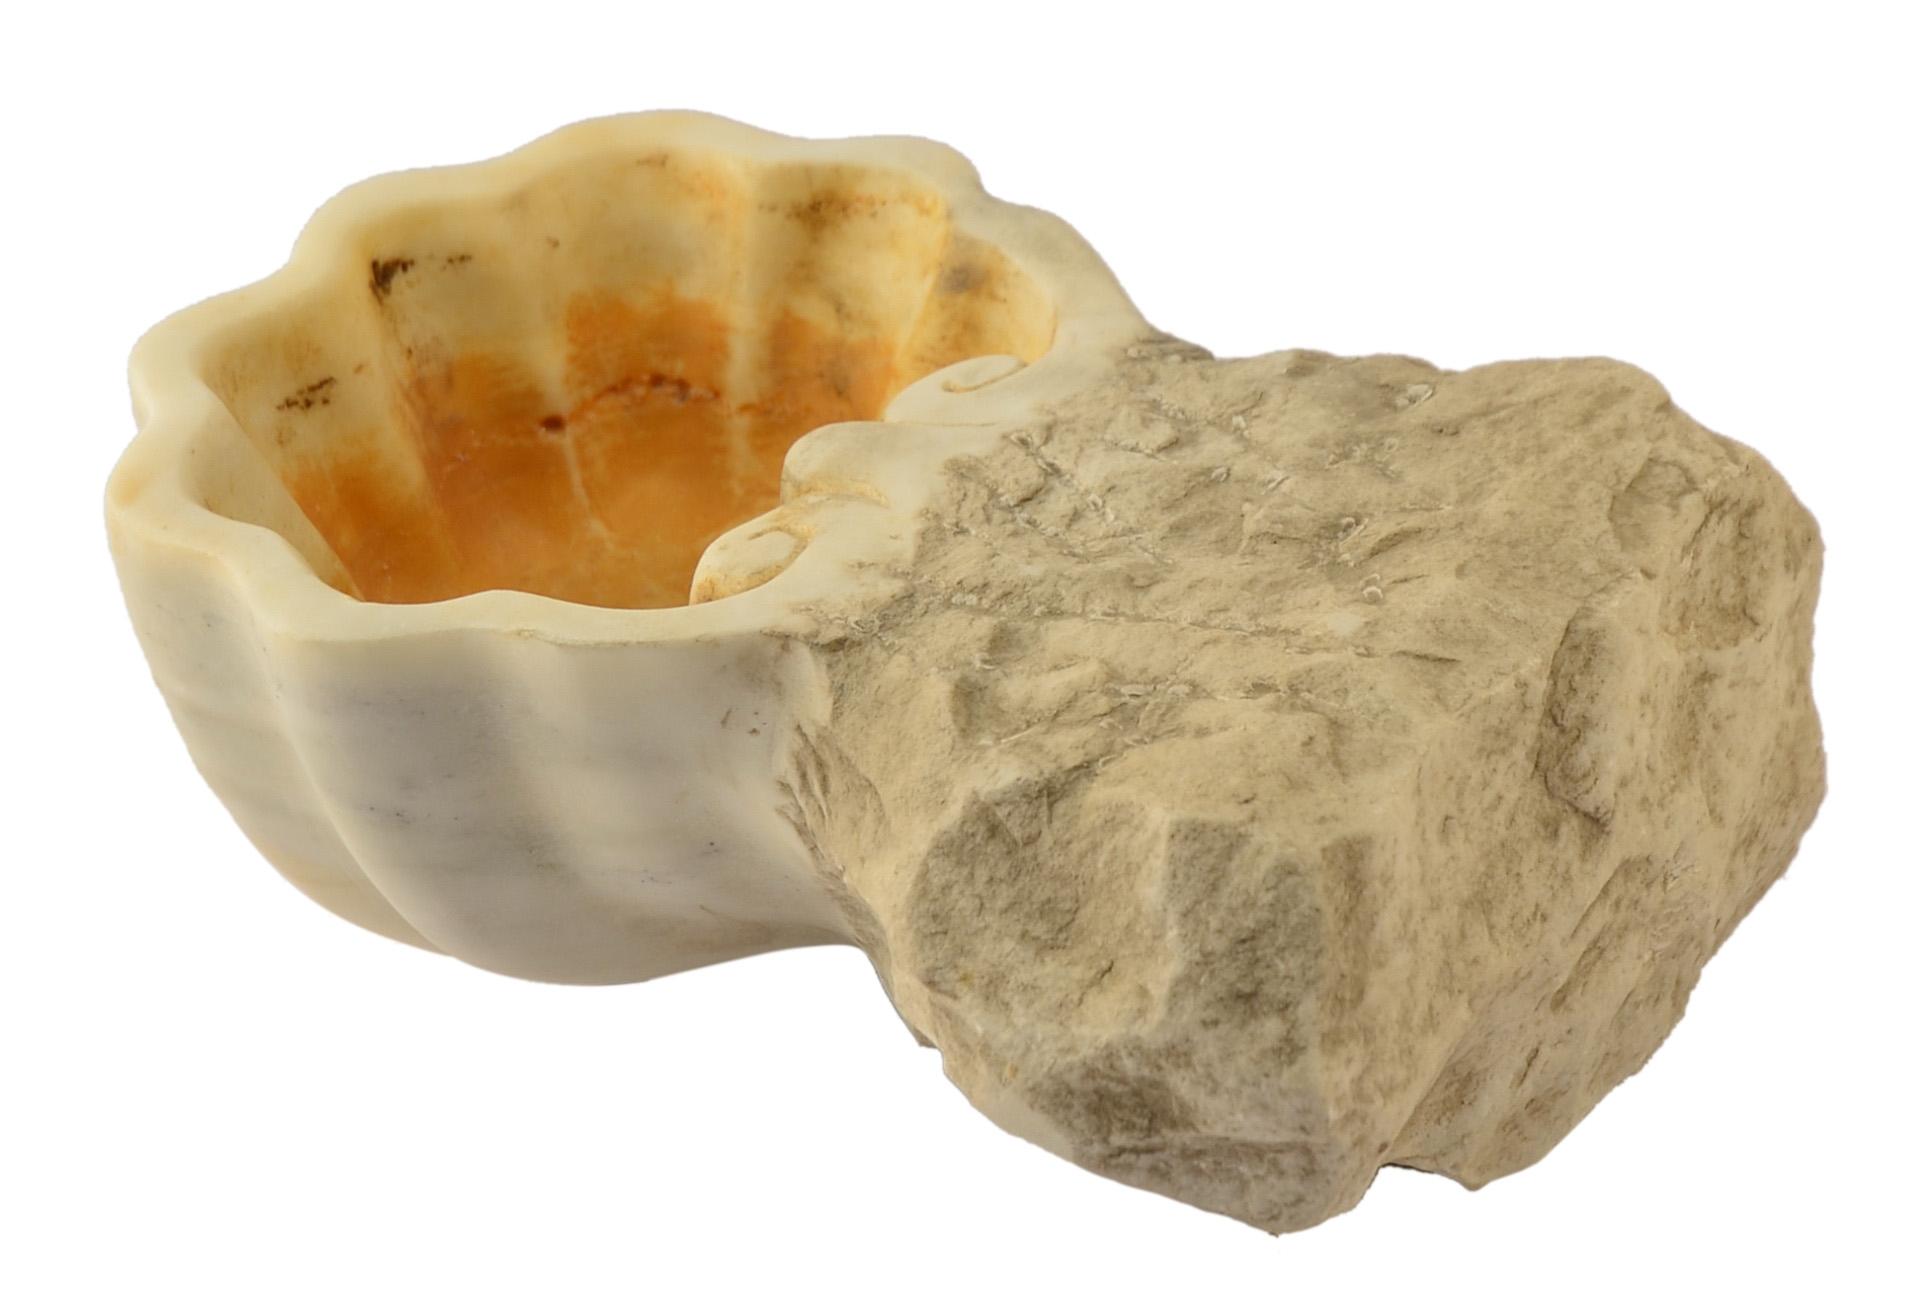 Buy Marble Tray Storage Stylish Crafted 17457684 | Italy2Us.com